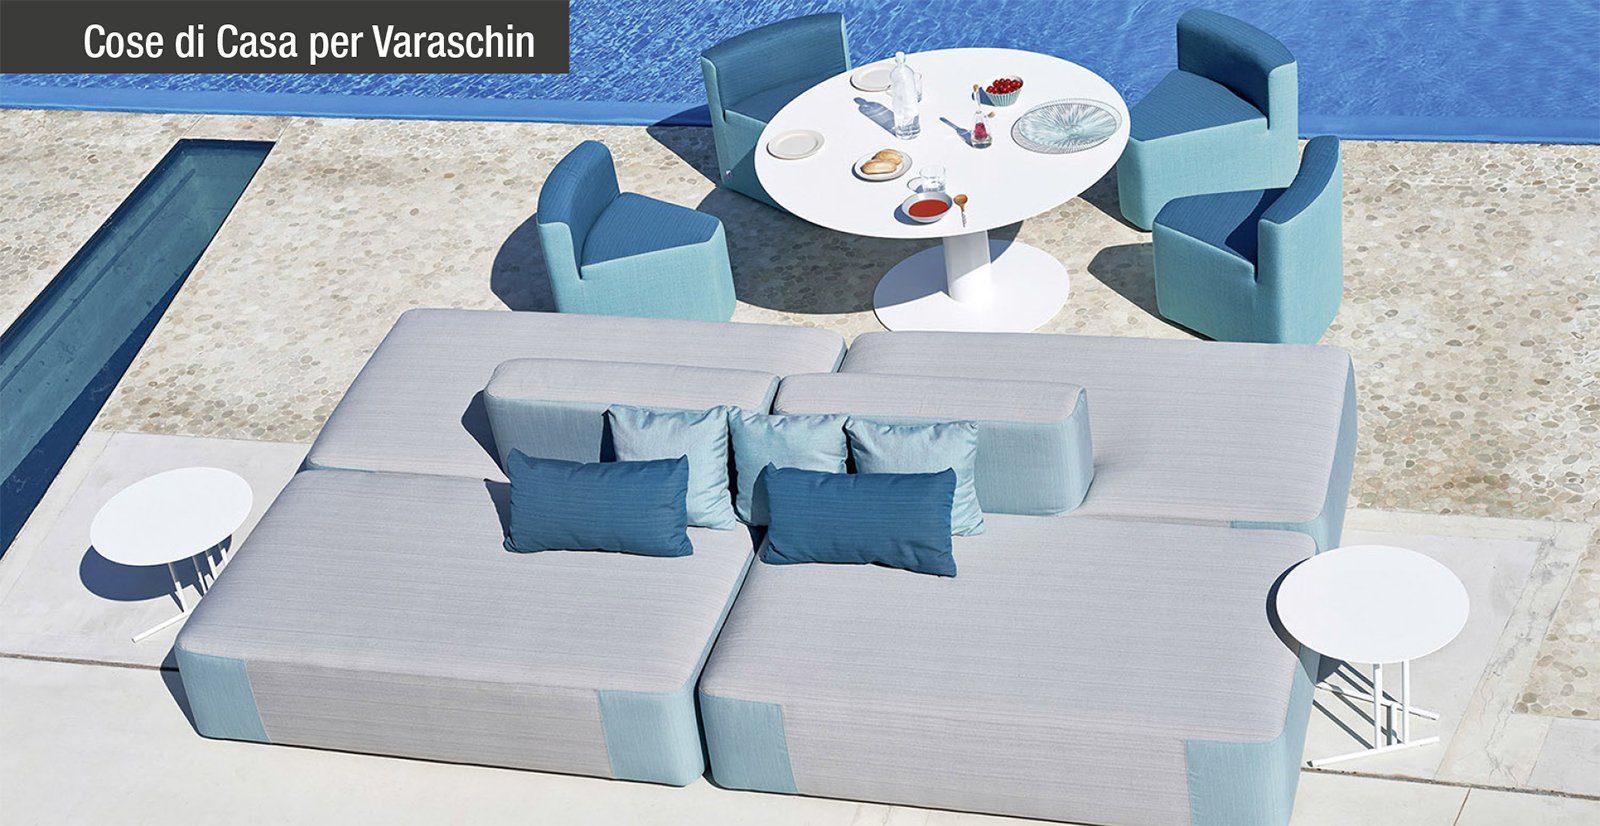 Comfort e qualit con l arredo open air di varaschin for Varaschin arredo giardino